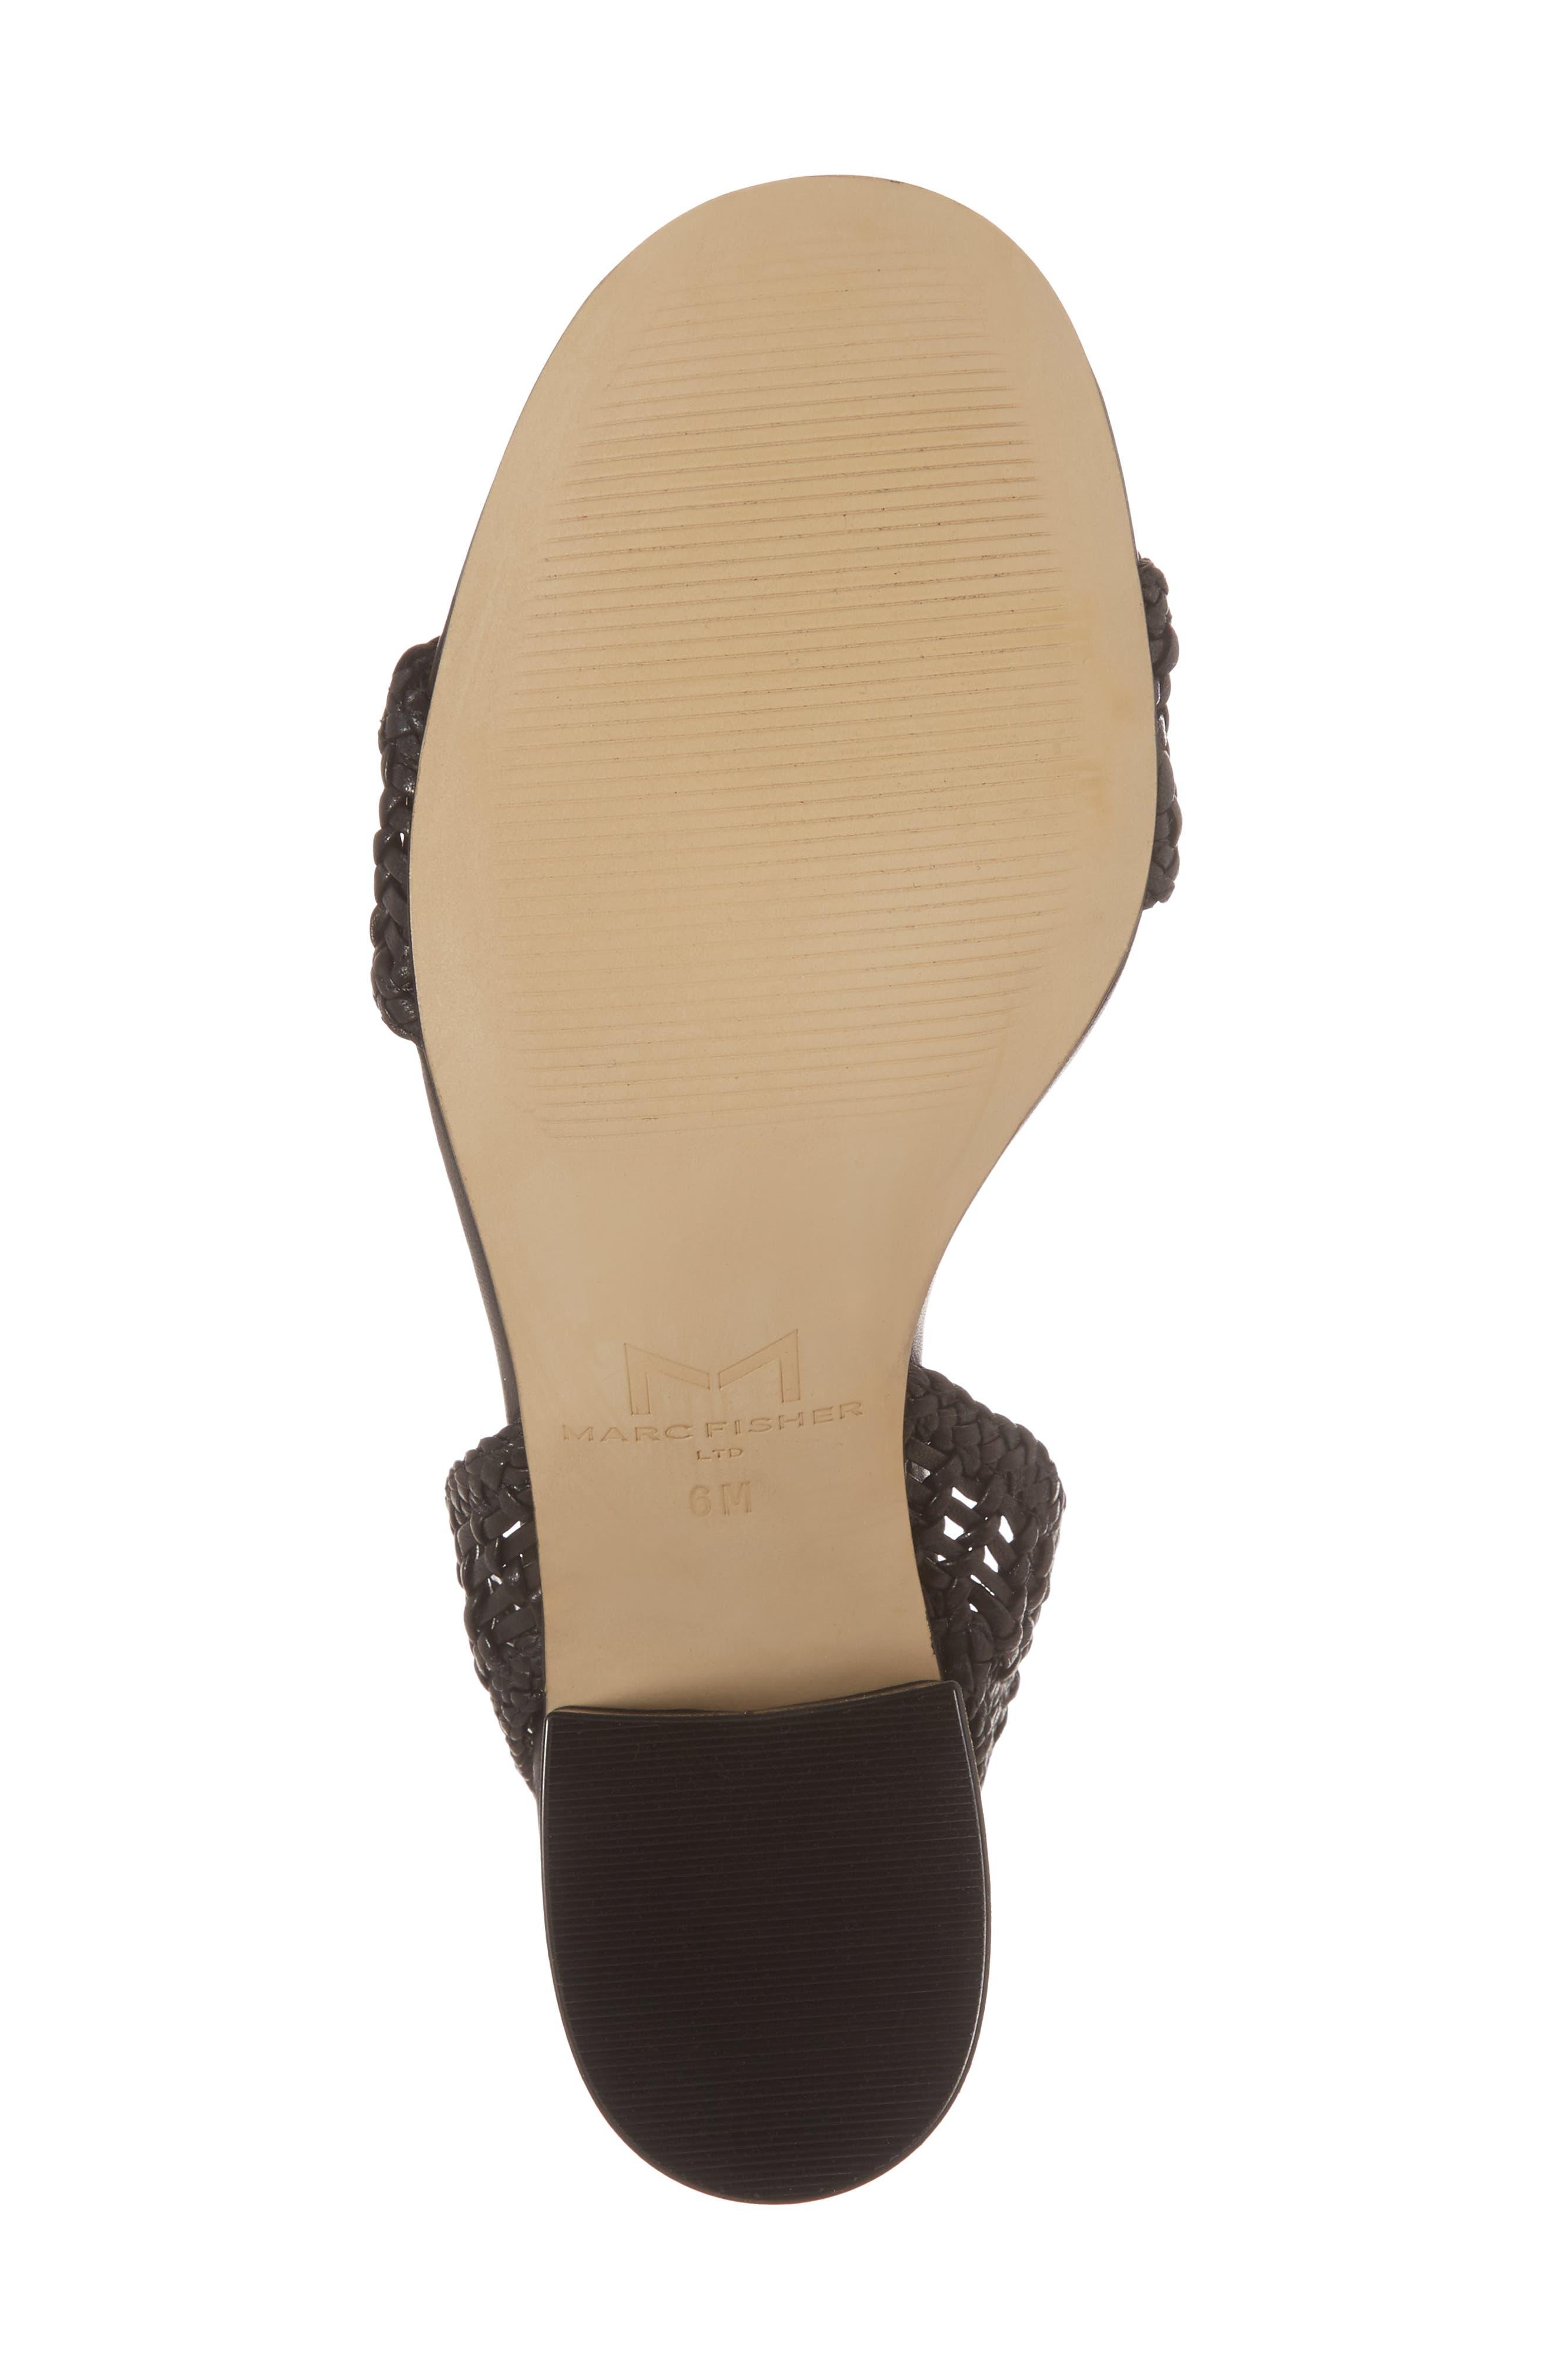 Amere Ankle Strap Sandal,                             Alternate thumbnail 6, color,                             Black Leather